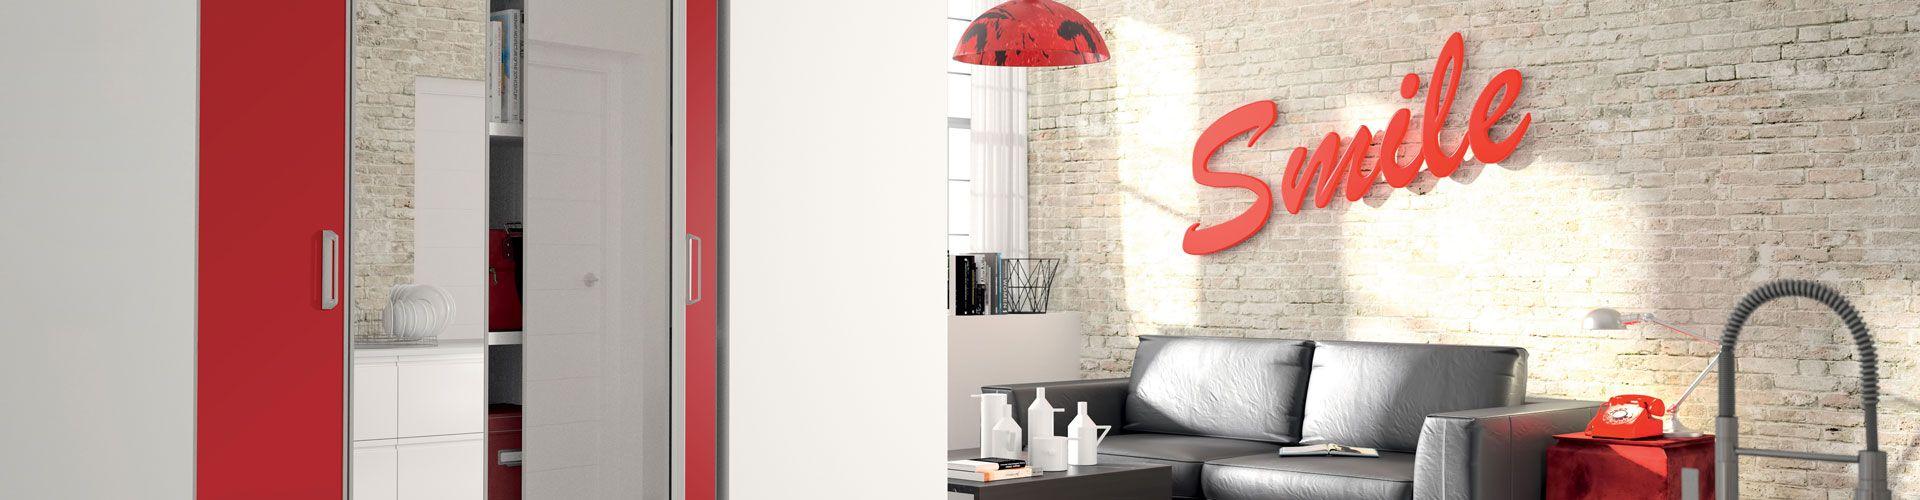 porte de placard pliante kazed. Black Bedroom Furniture Sets. Home Design Ideas